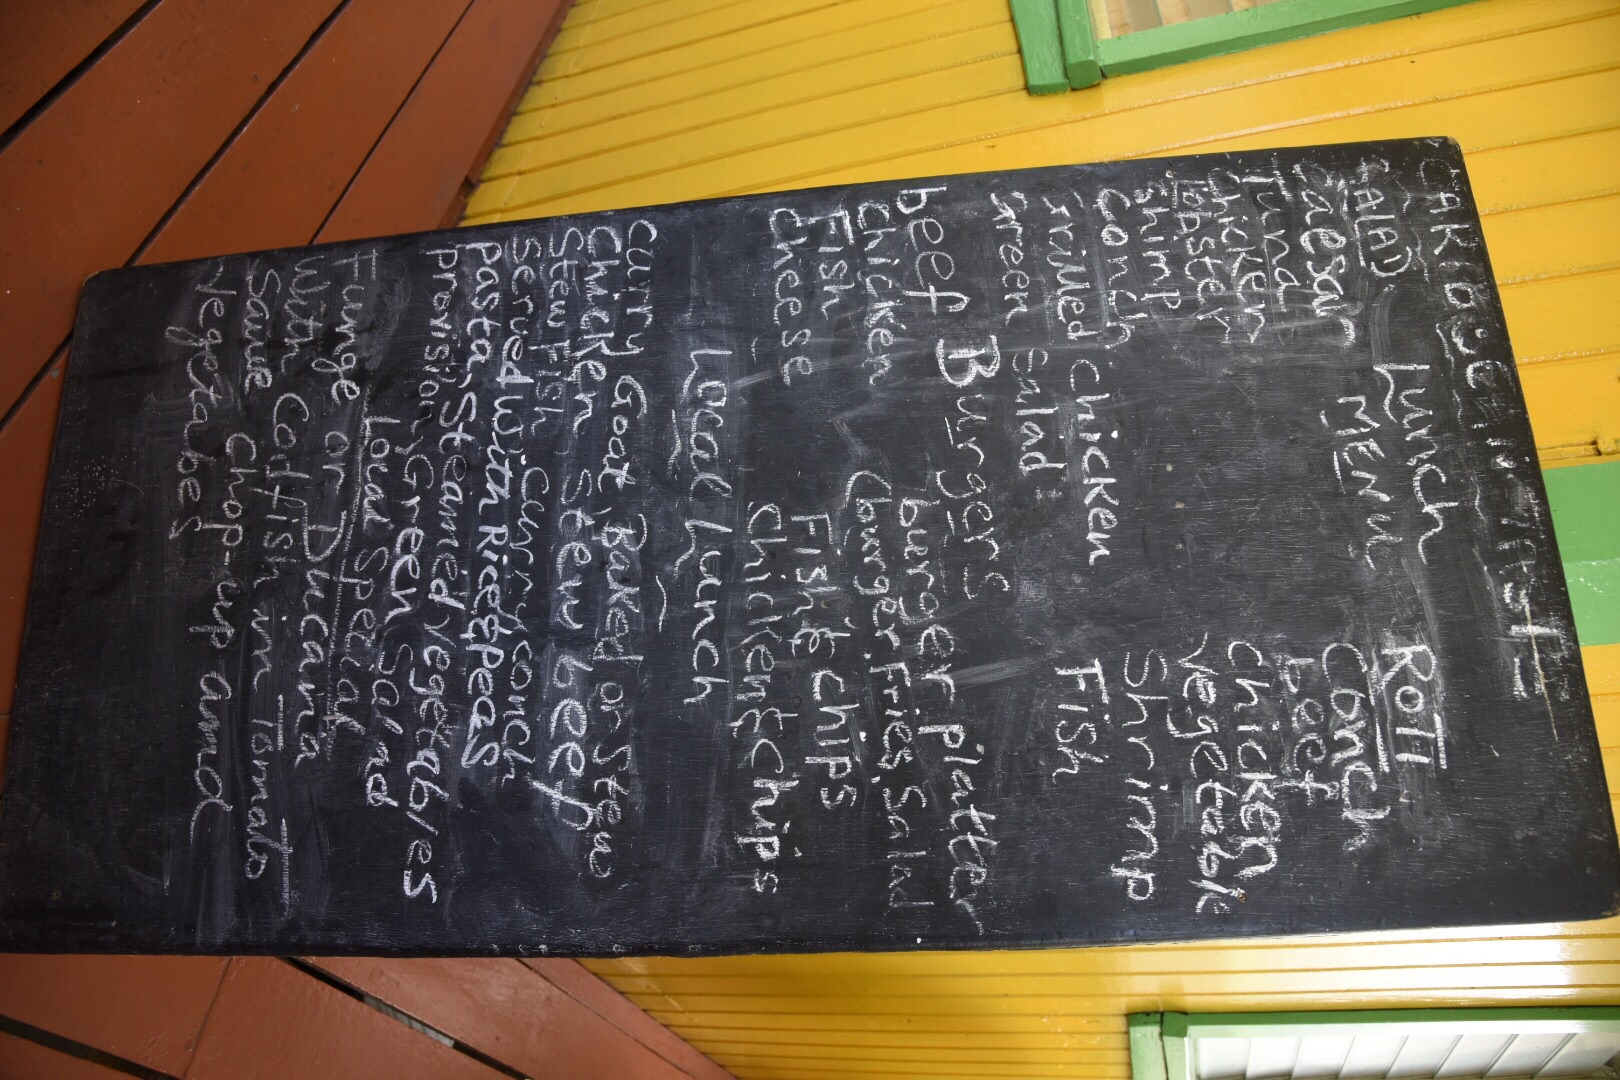 The menu at Caribbean Taste